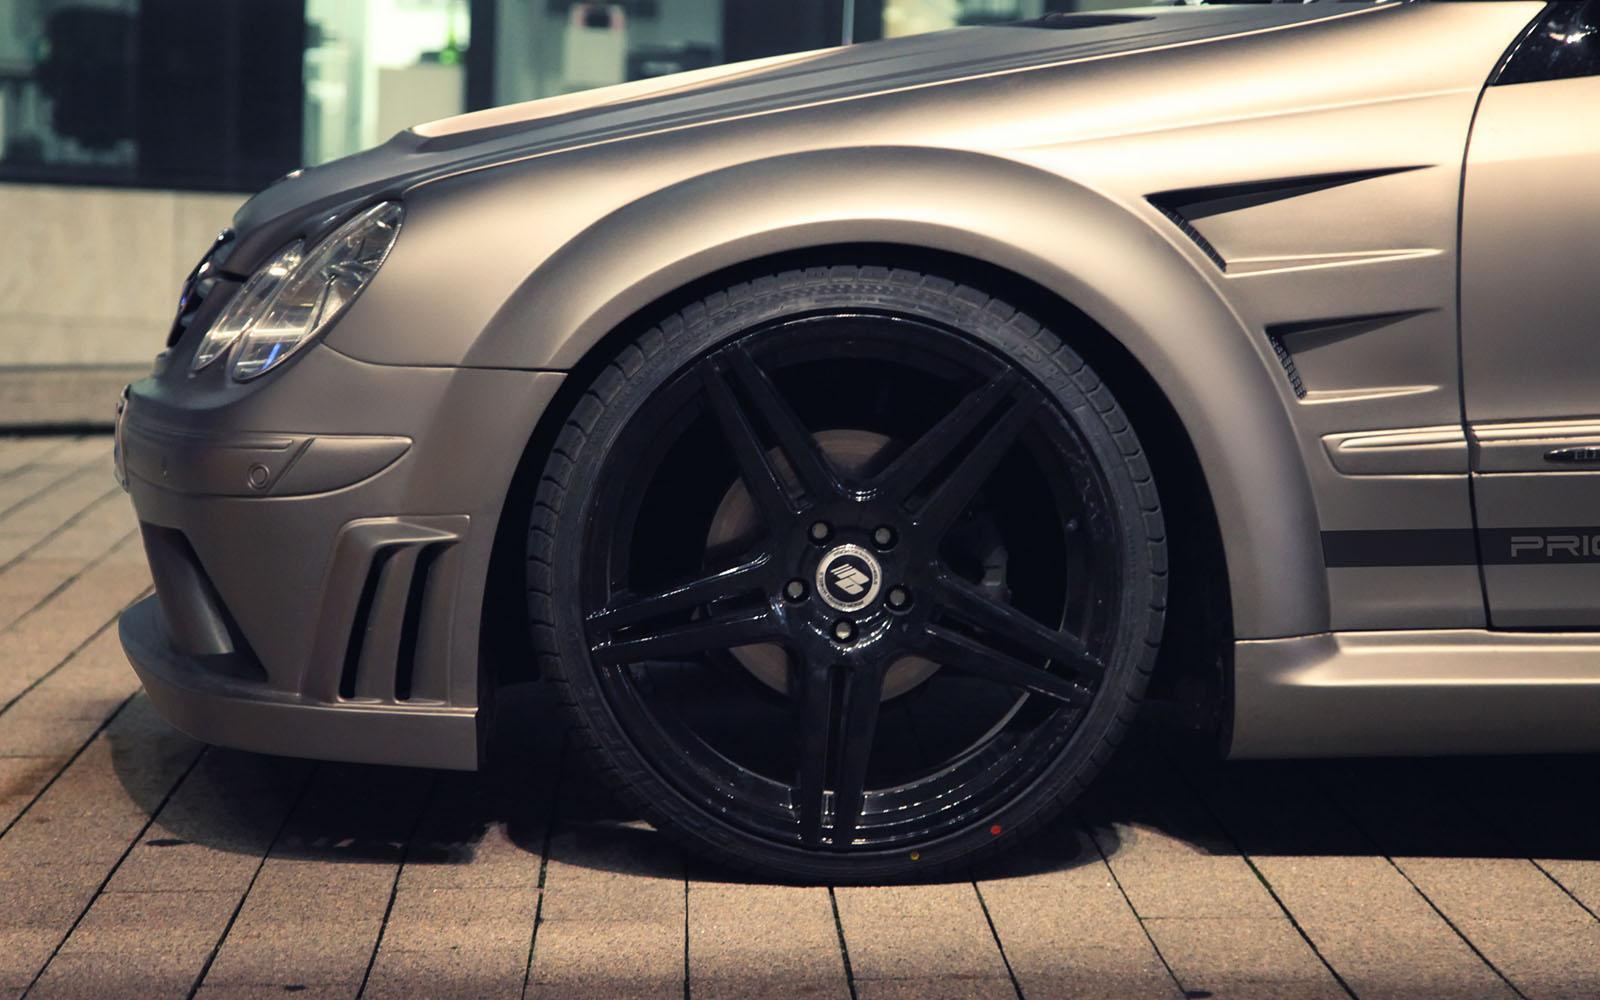 Mercedes benz clk amg black series body kit for Mercedes benz clk black series body kit